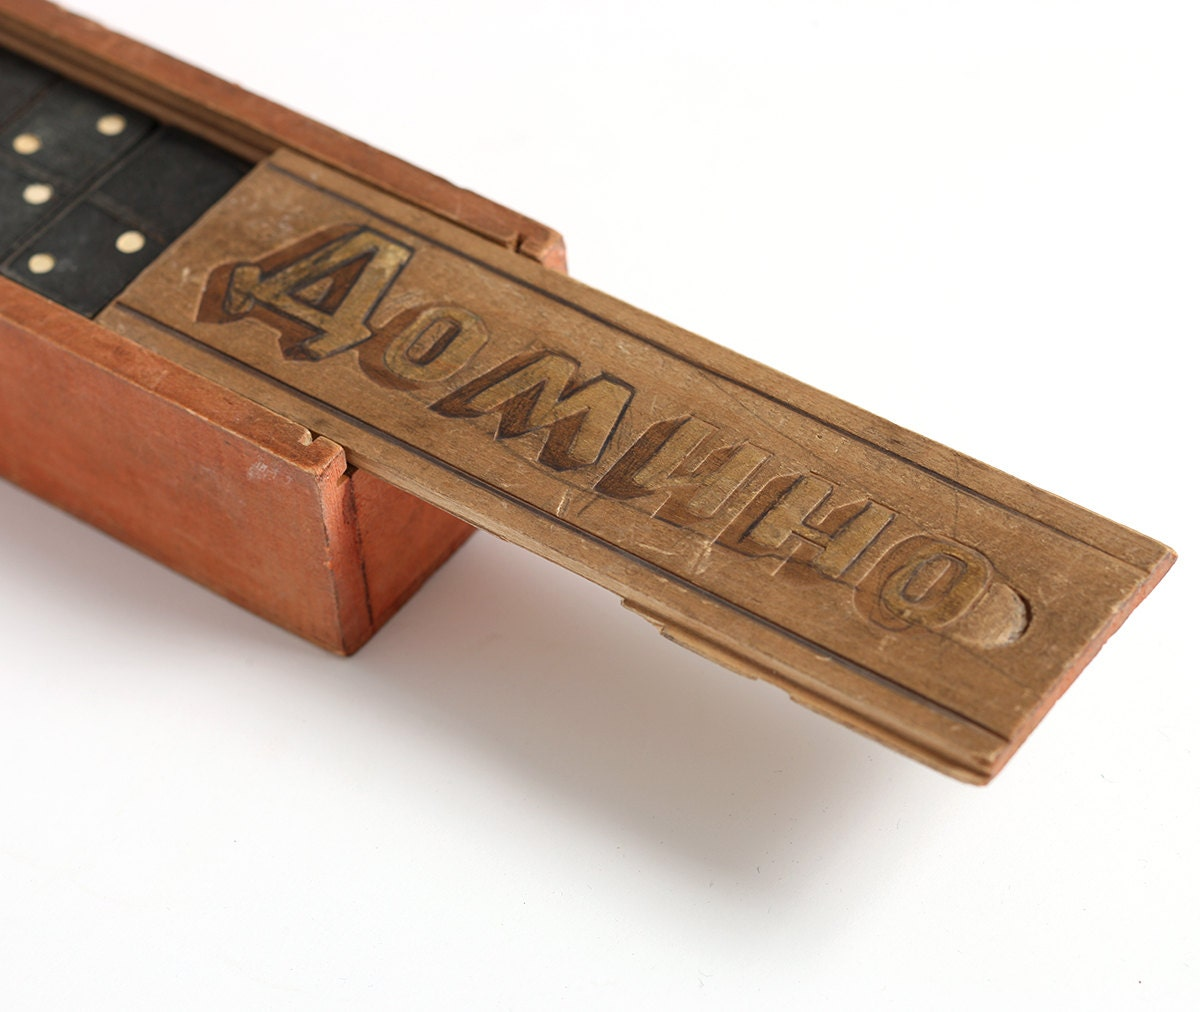 Vintage dominos game set wooden domino set by mmvintagestore